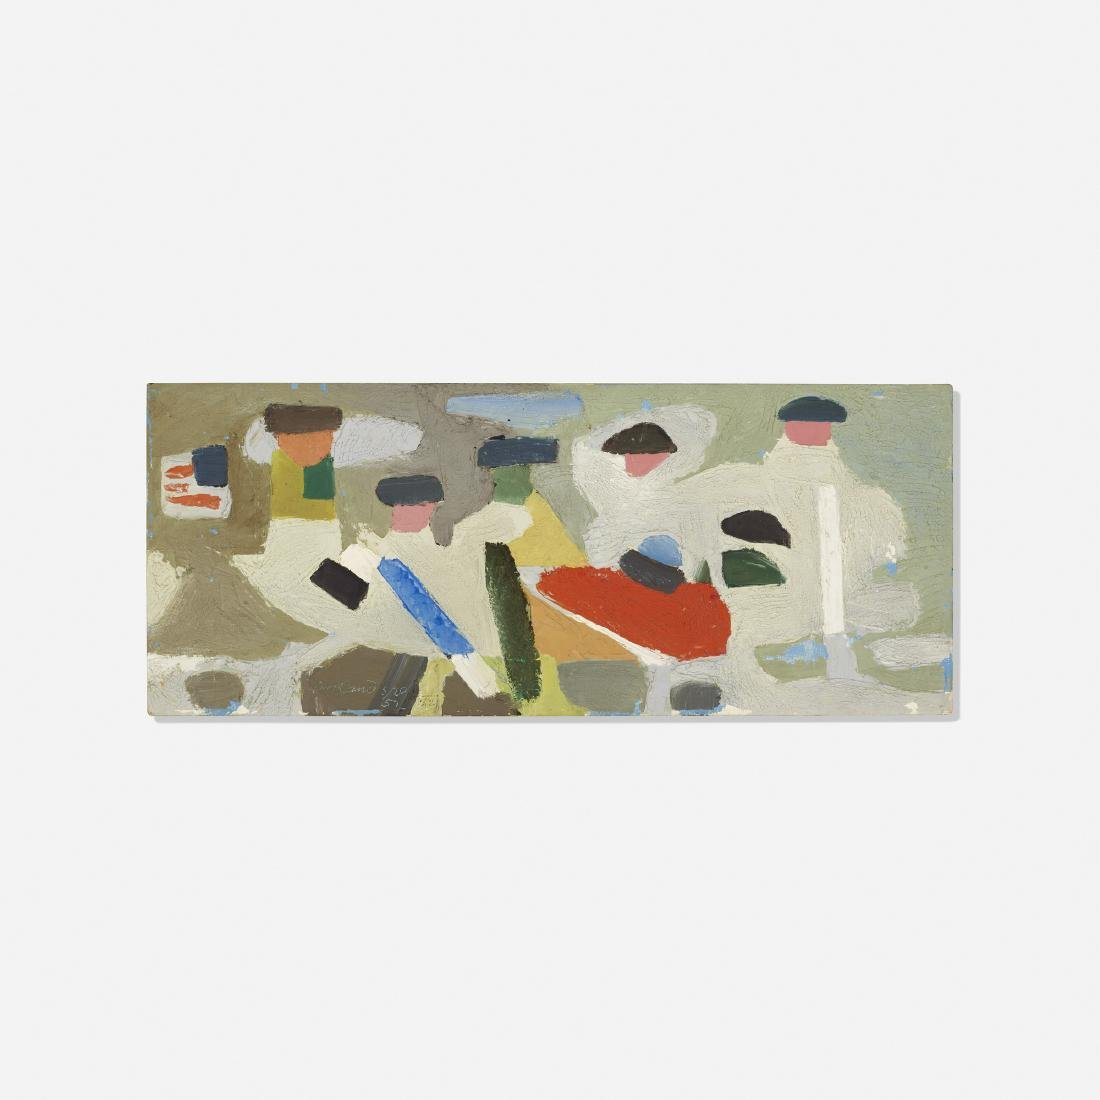 Paul Rand, Untitled (Washington Crossing the Delaware)